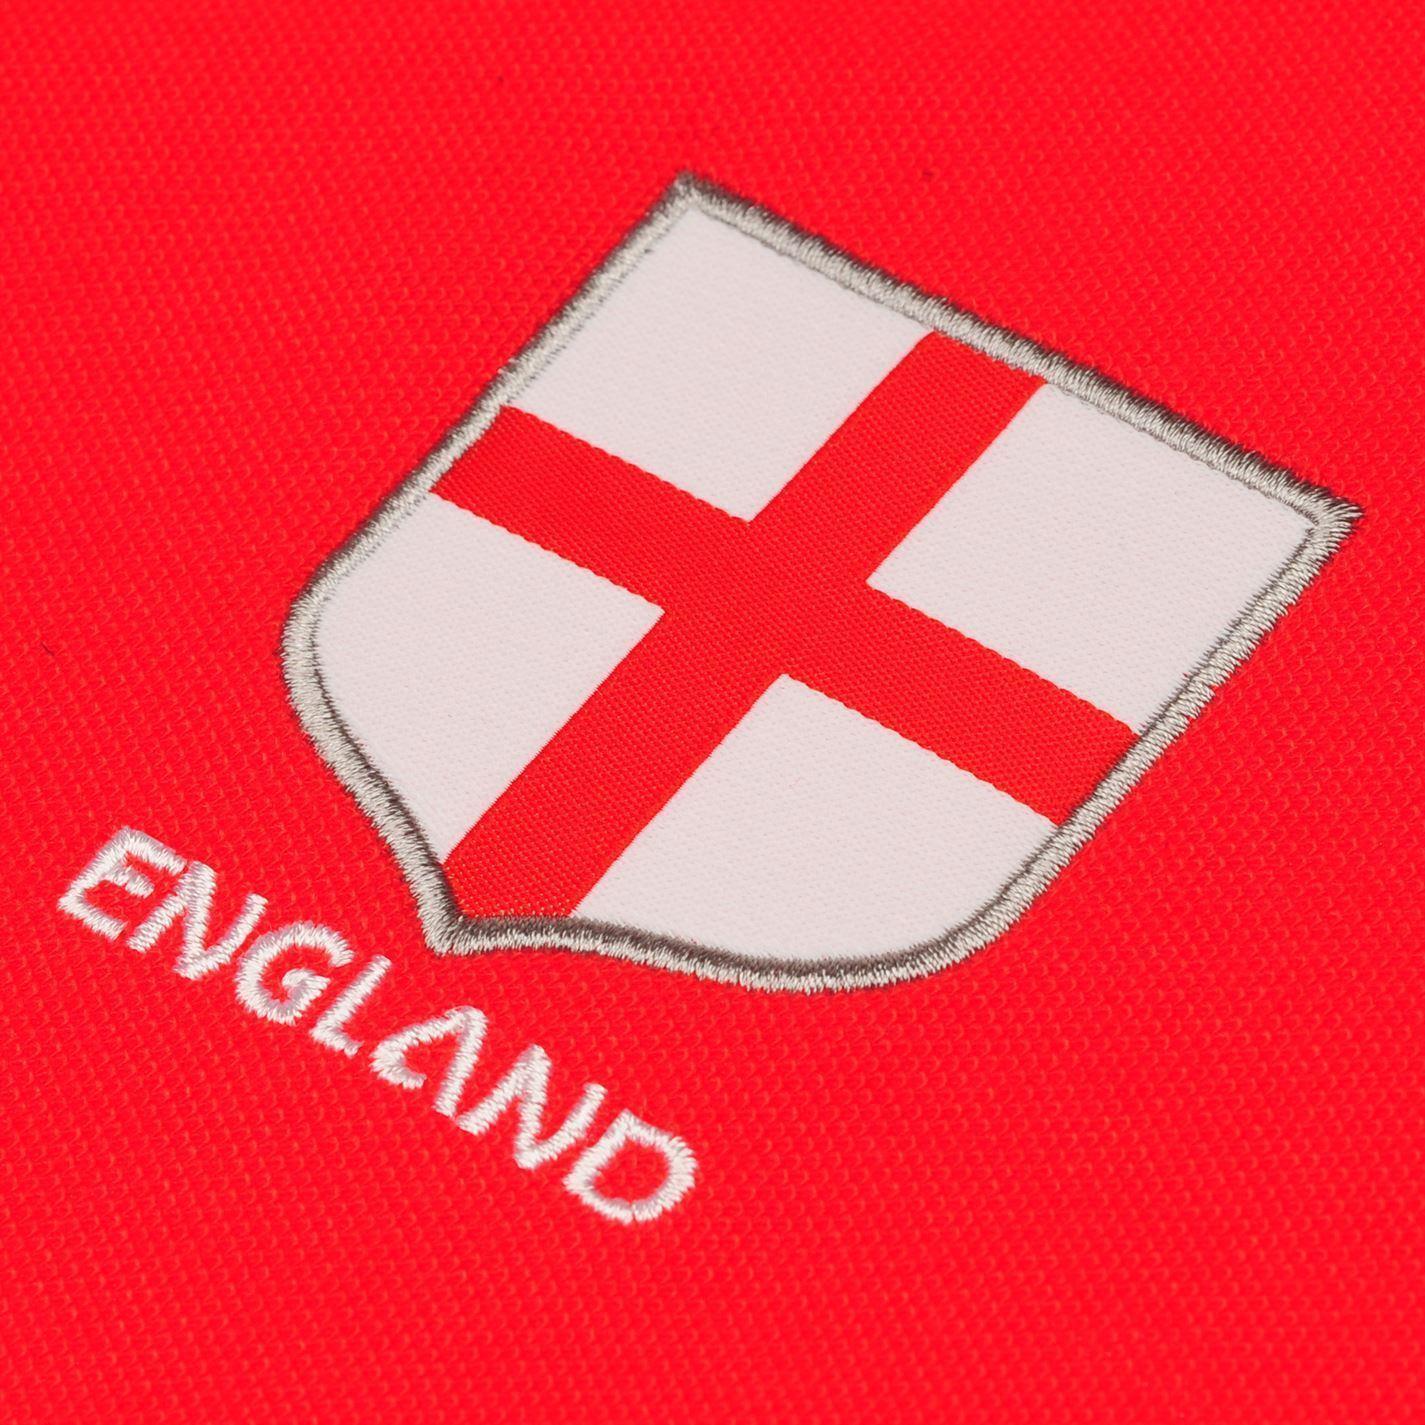 miniature 4 - FIFA Coupe du monde 2018 Angleterre Polo Shirt Homme Football Soccer Top T-Shirt Tee